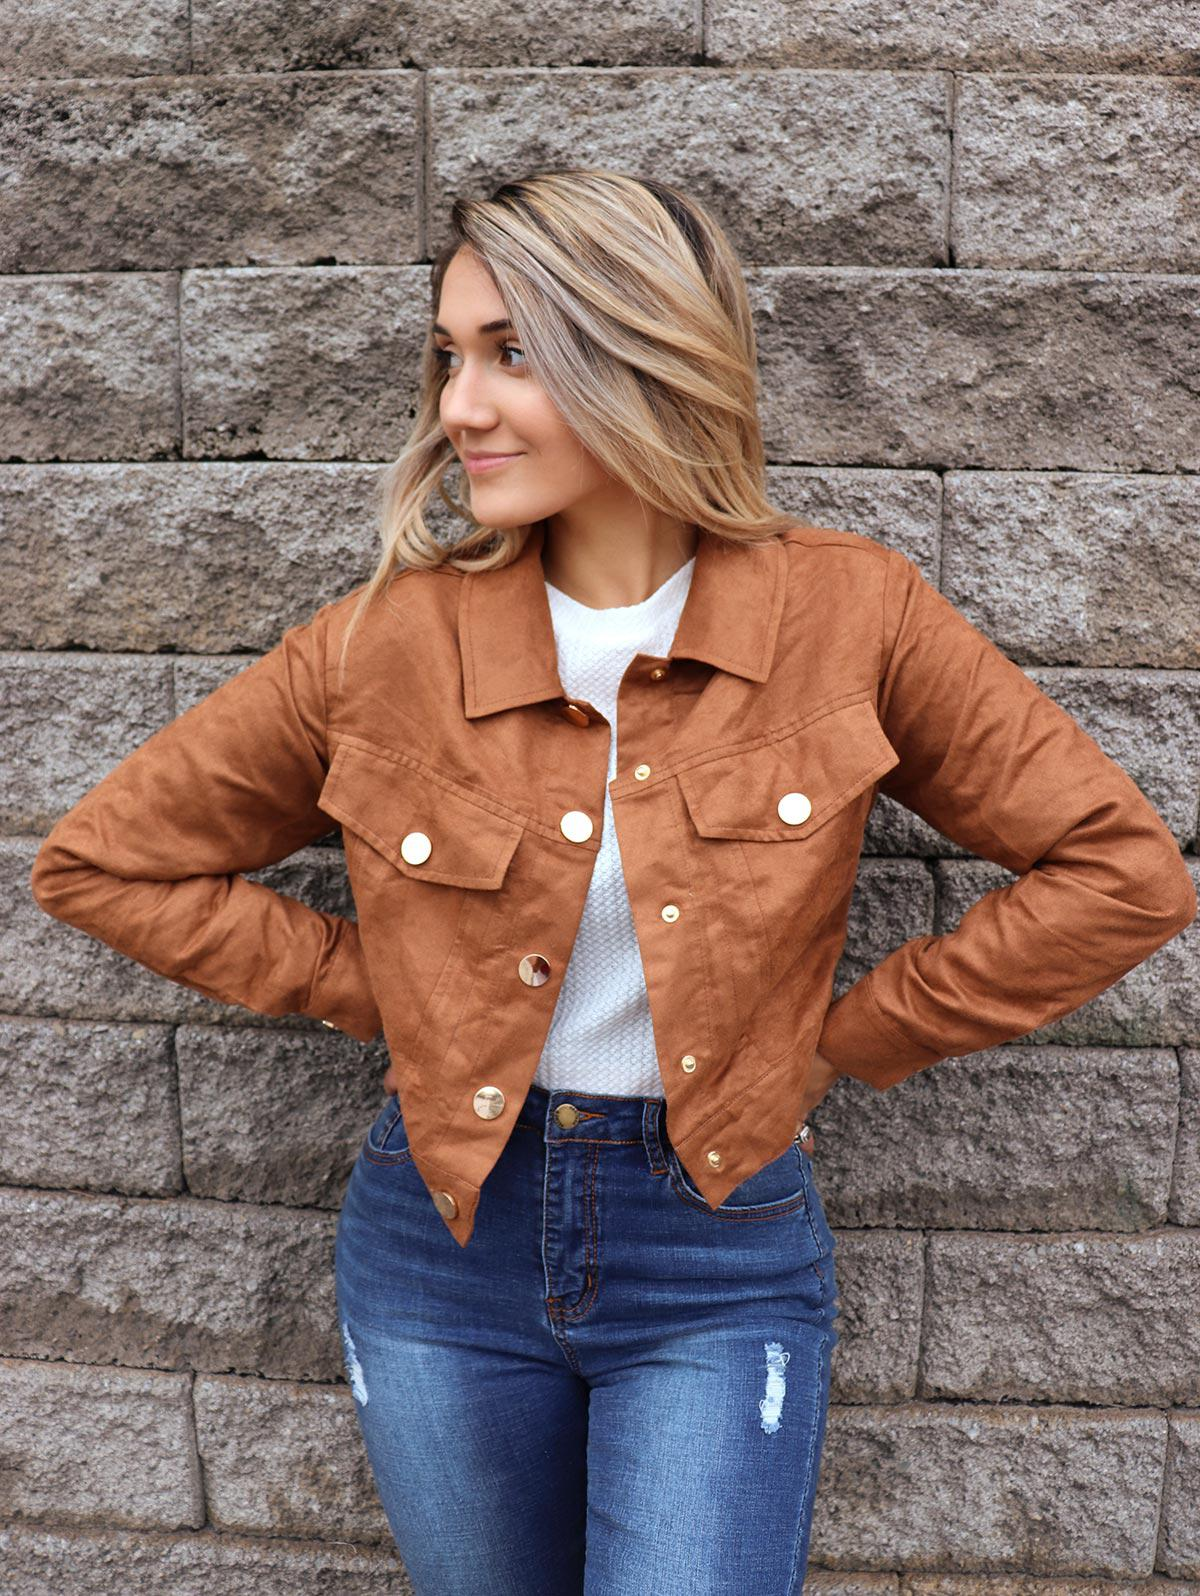 ZAFUL x Yasmine Bateman Snap Button Pockets Faux Suede Jacket thumbnail